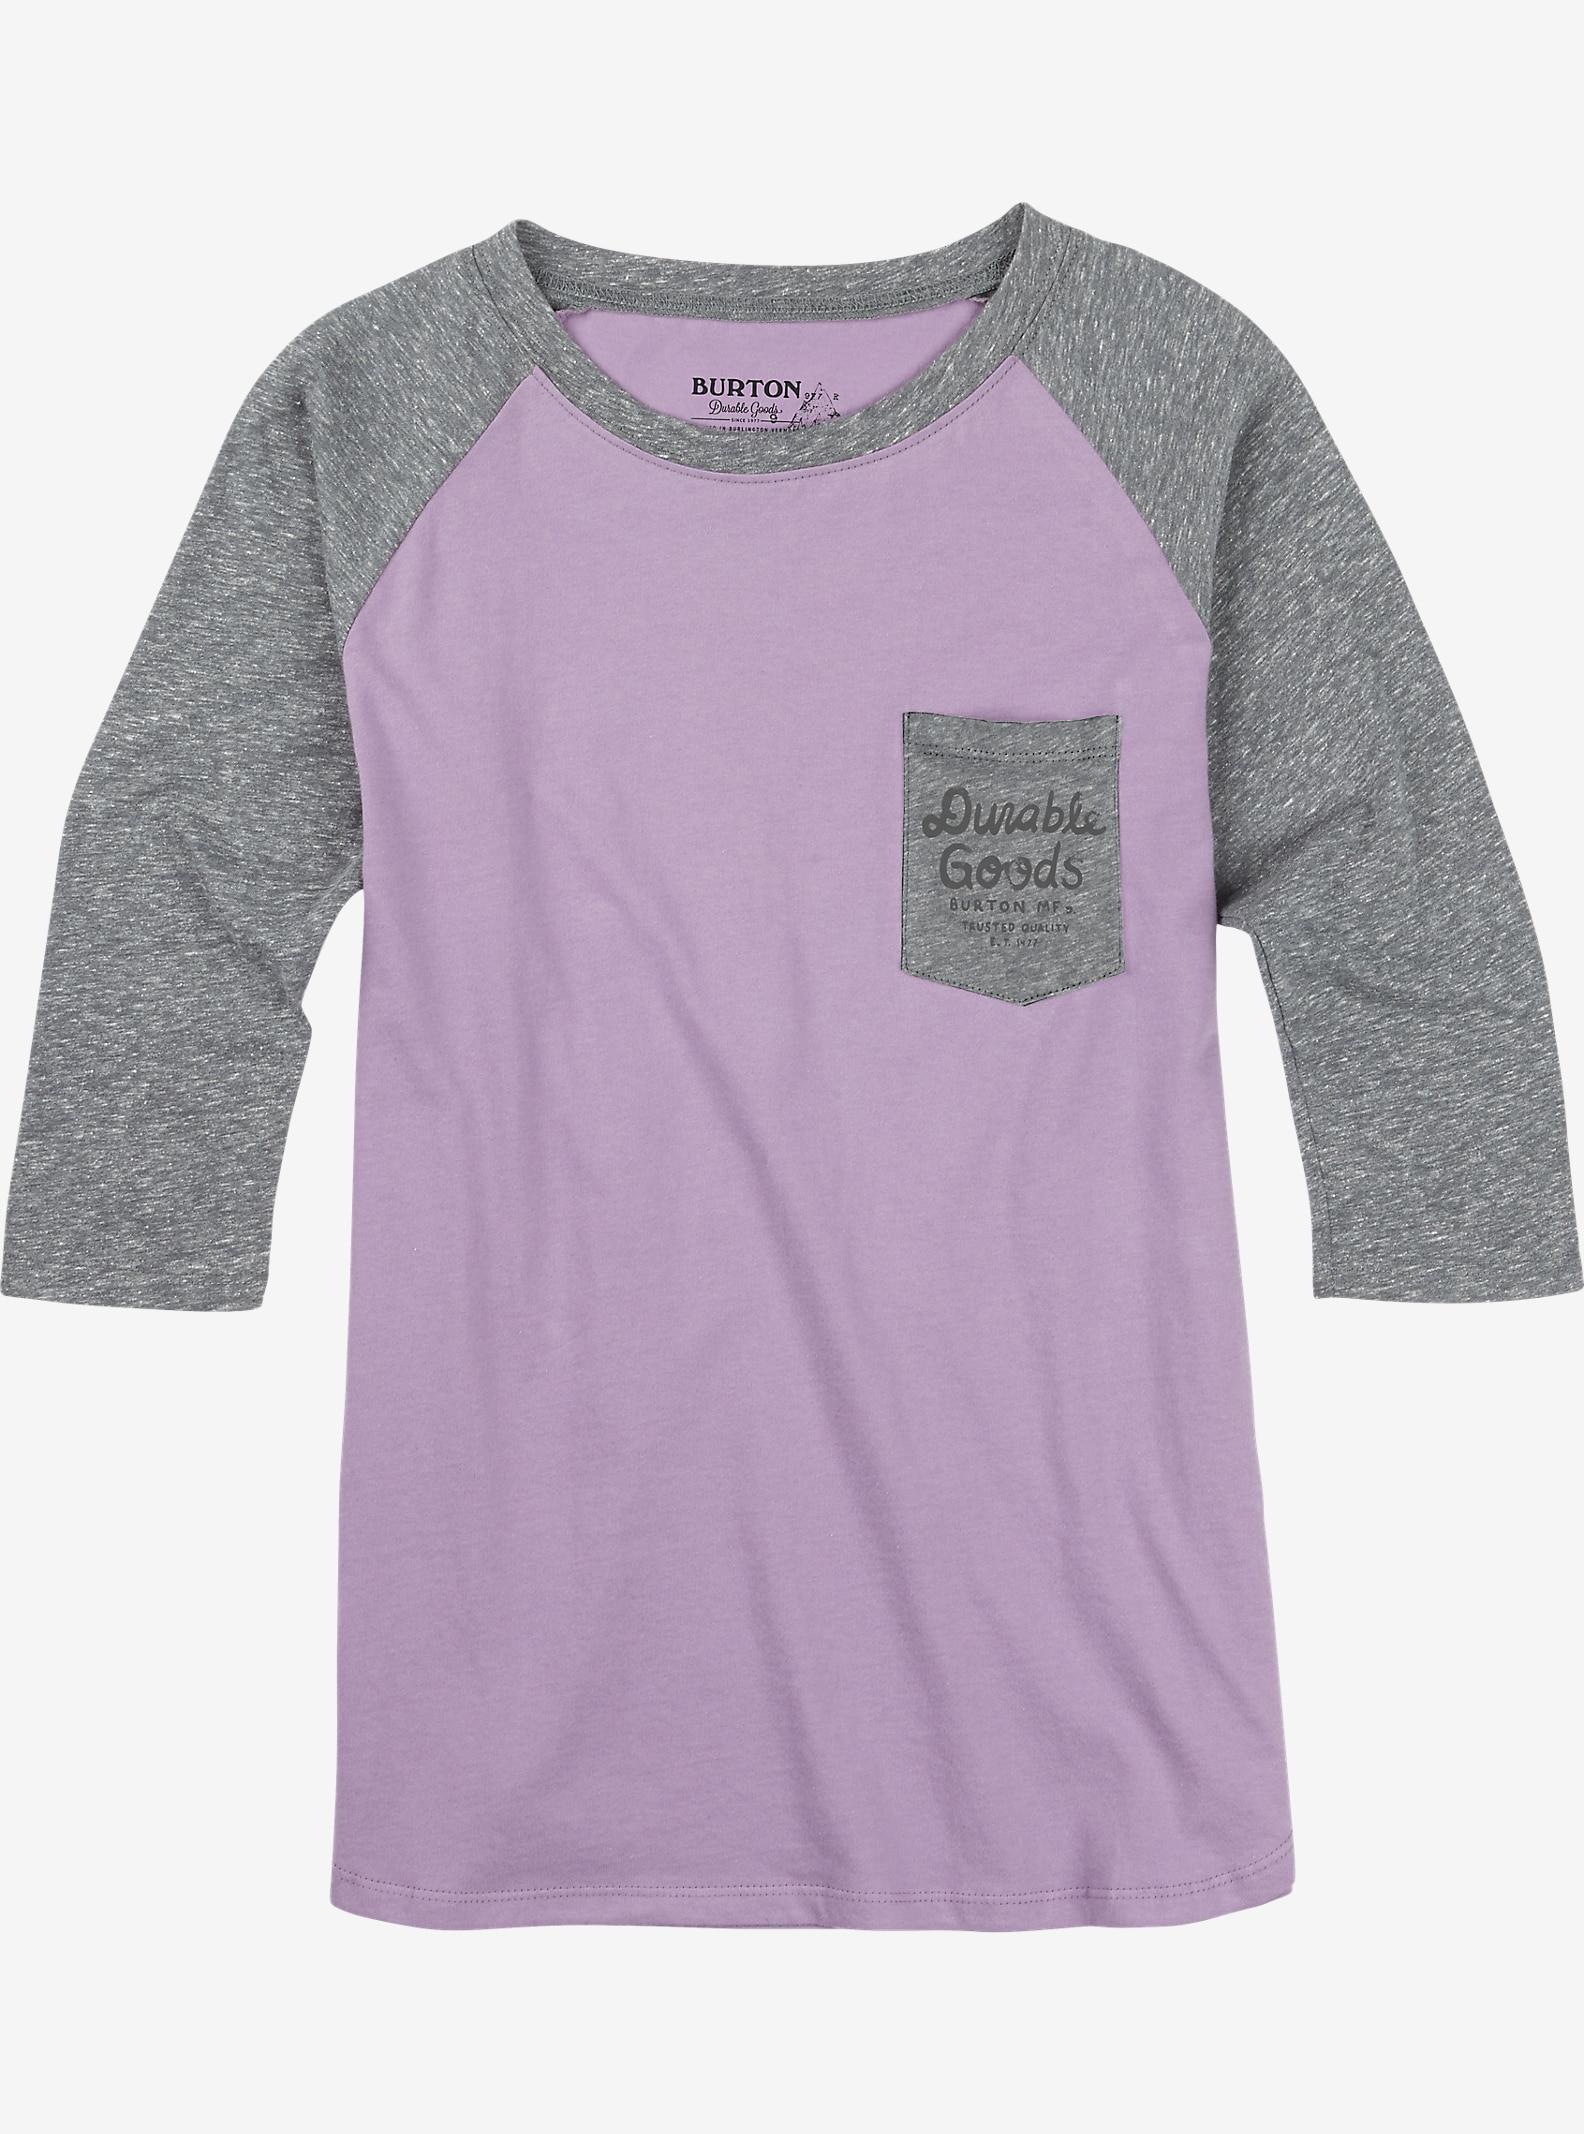 Burton Trusted Raglan T Shirt shown in Dusty Grape